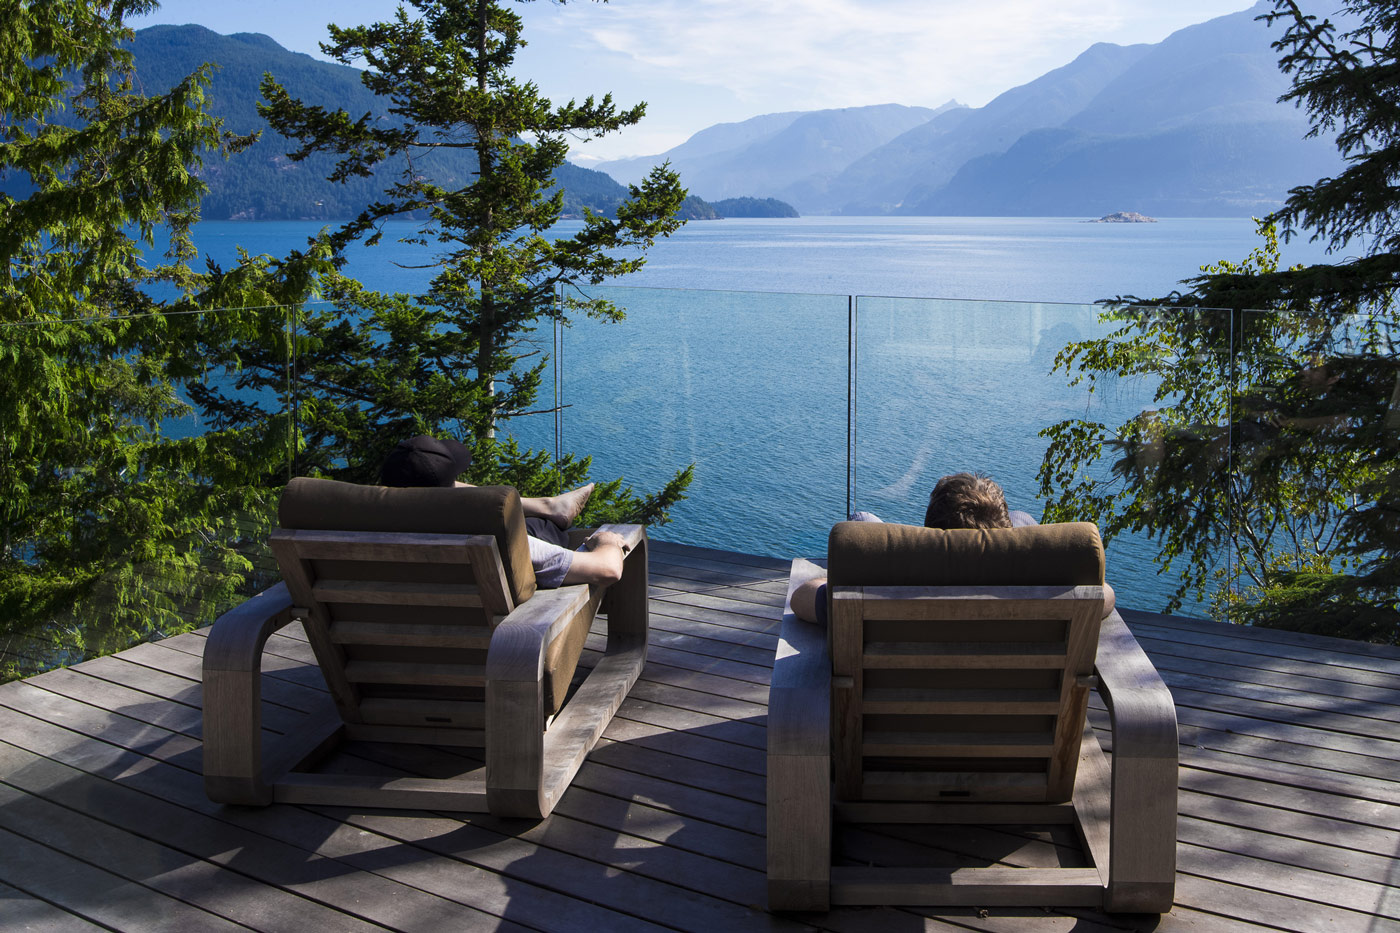 Water & Mountain Views, Balcony, Glass Balustrading, House on Gambier Island, British Columbia